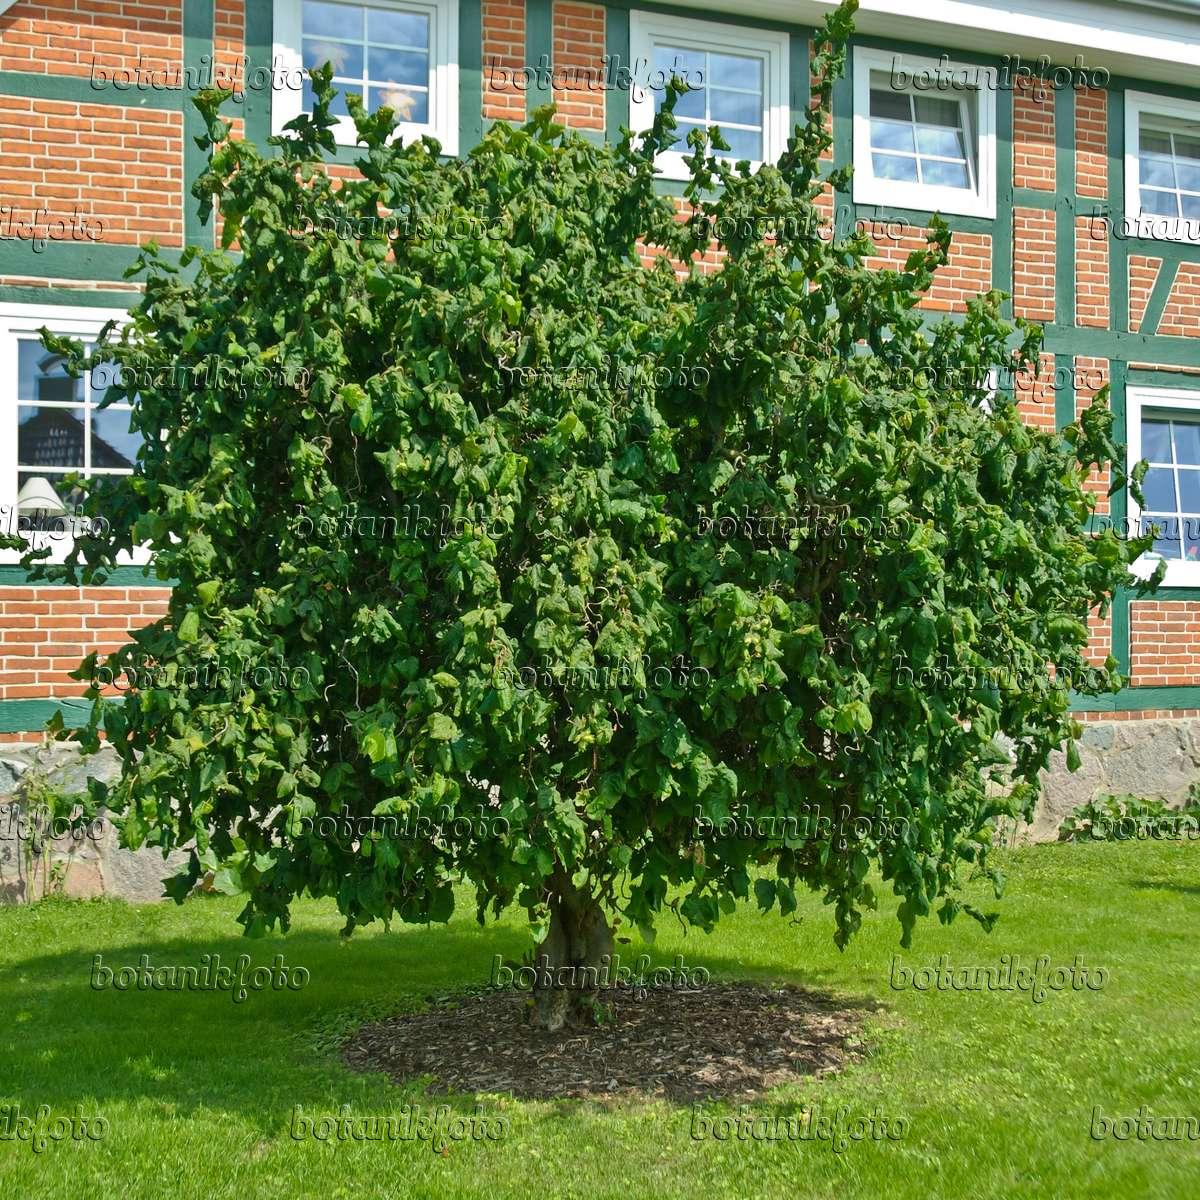 Harry lauder walking stick trees - 517164 Harry Lauder S Walking Stick Corylus Avellana Contorta